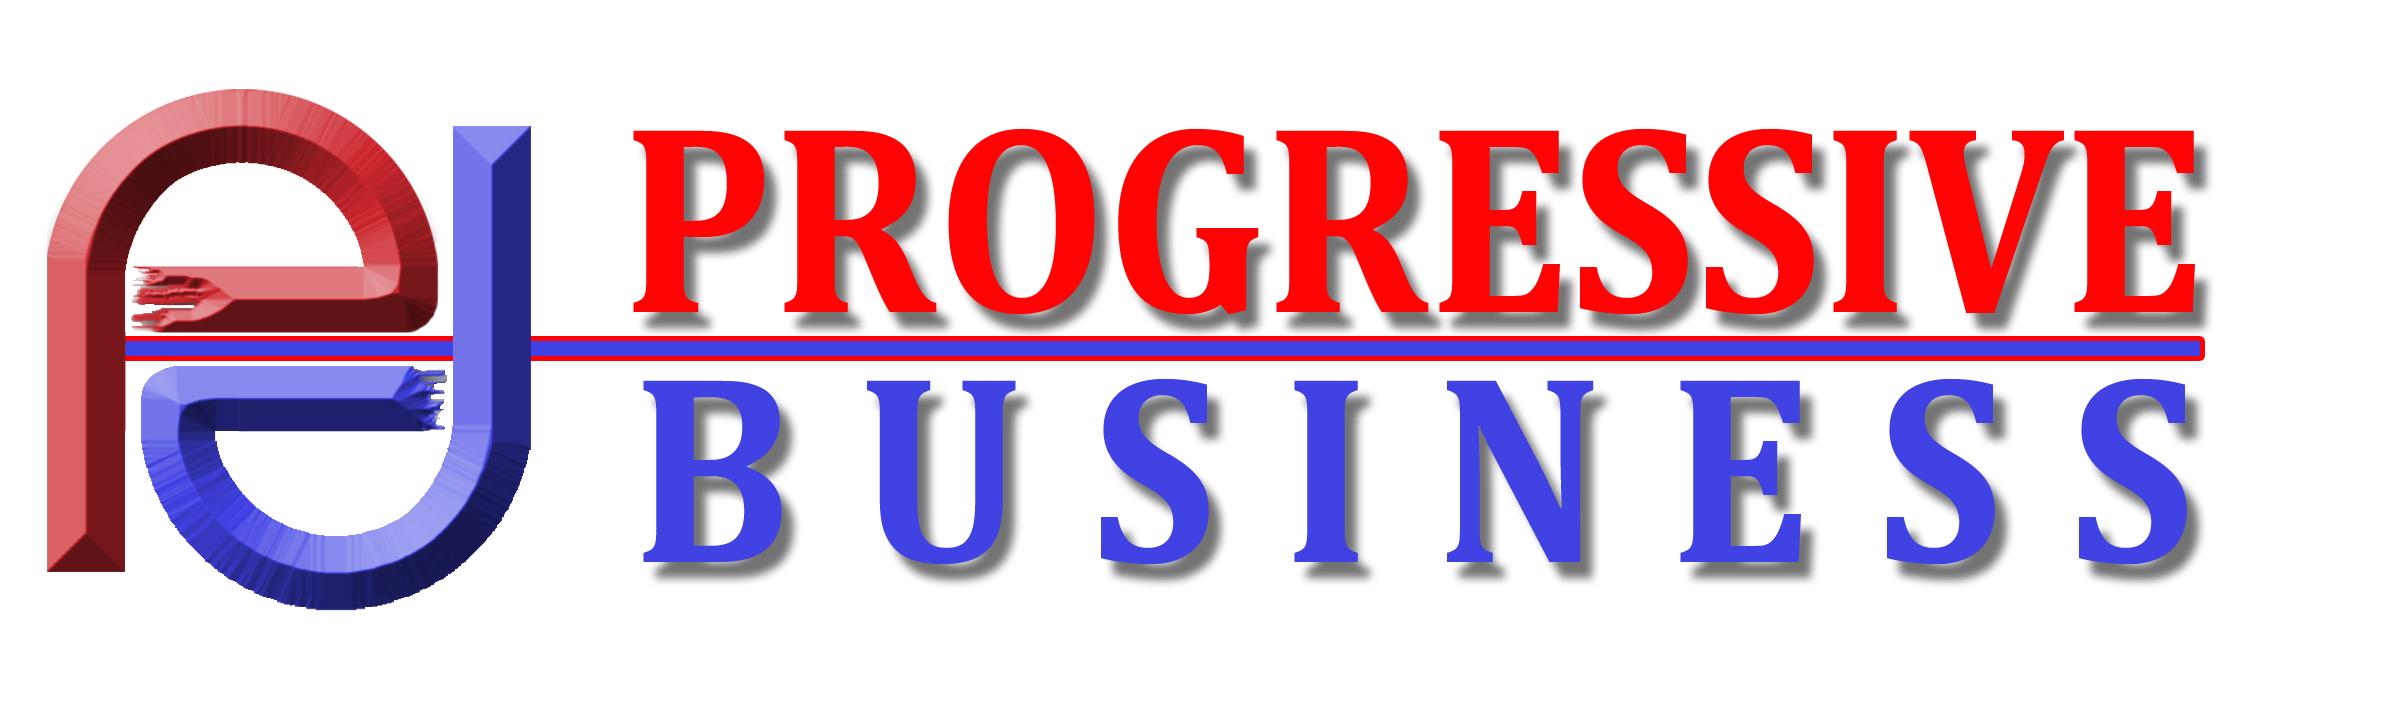 Logo Design by Kitz Malinao - Entry No. 19 in the Logo Design Contest Captivating Logo Design for Progressive Business.